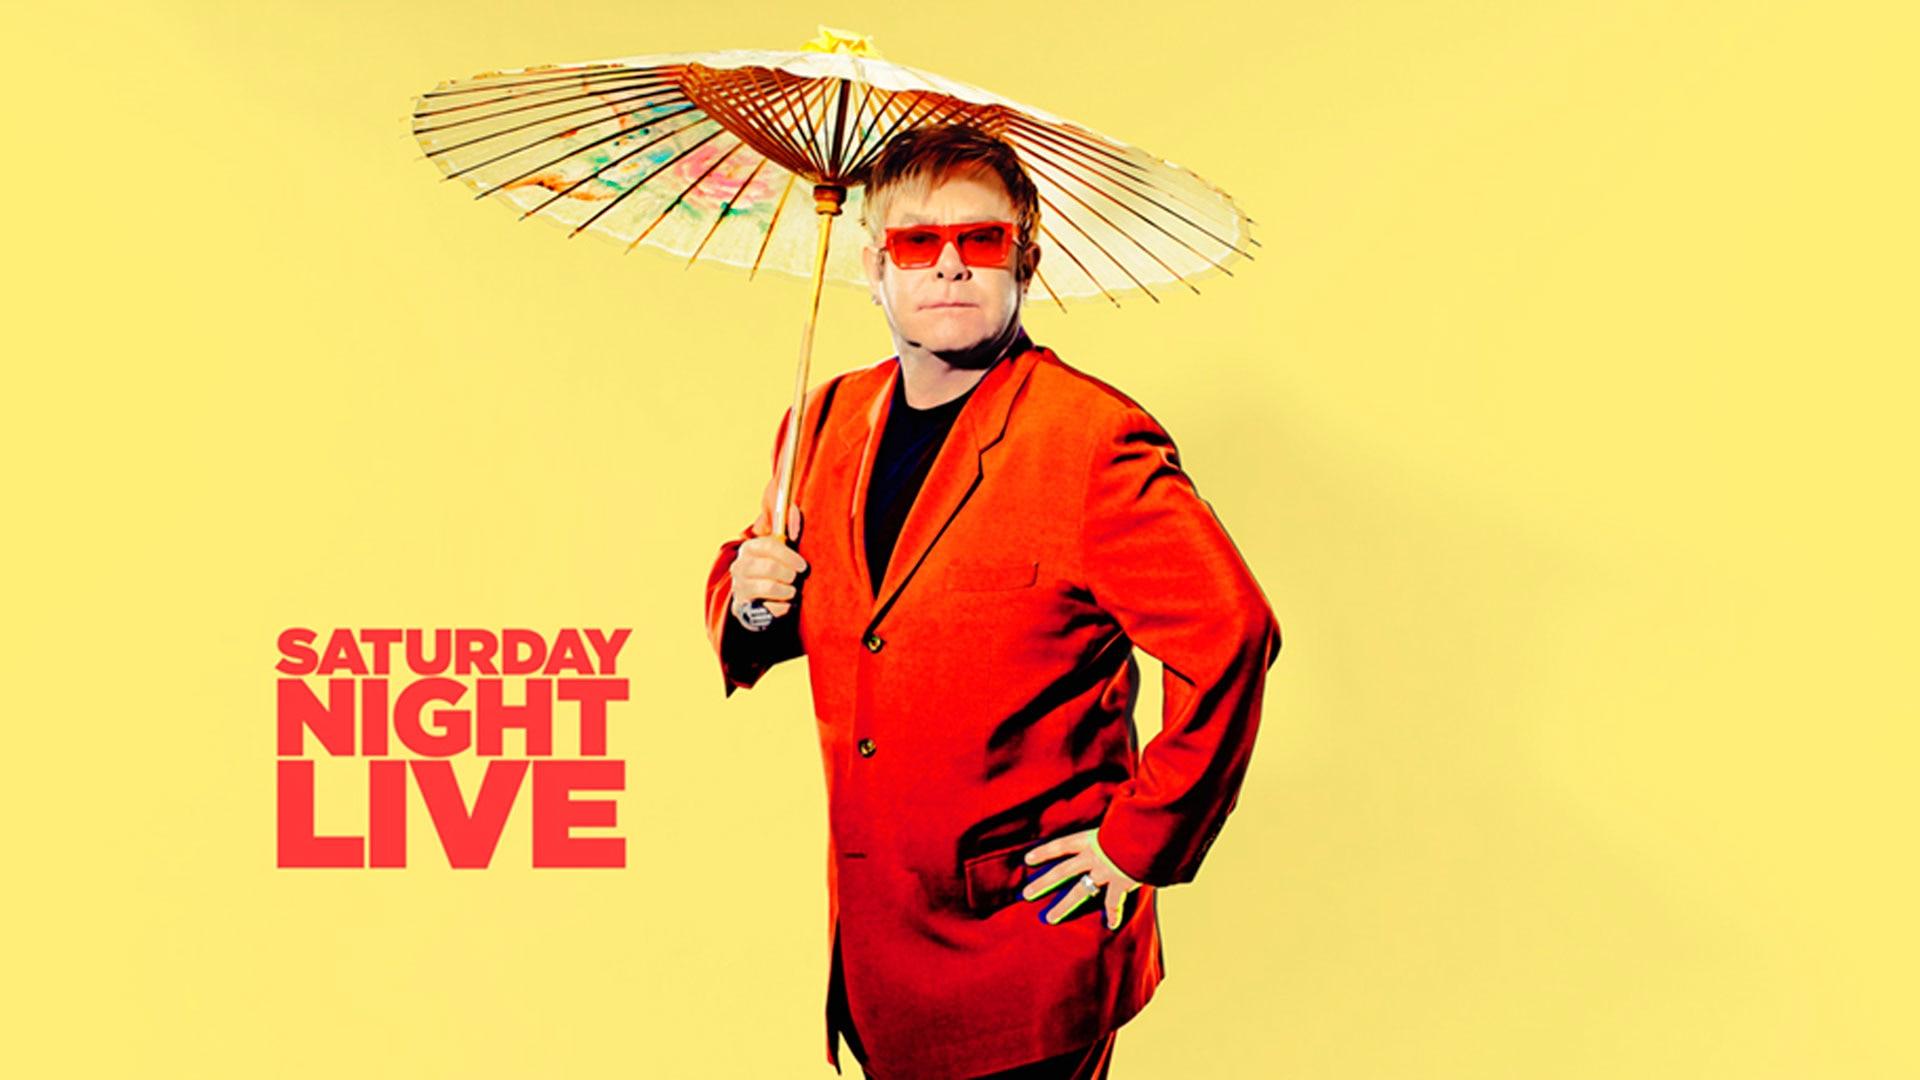 Saturday Night Live Dick In A Box Hilarious Langarmshirt Shirt